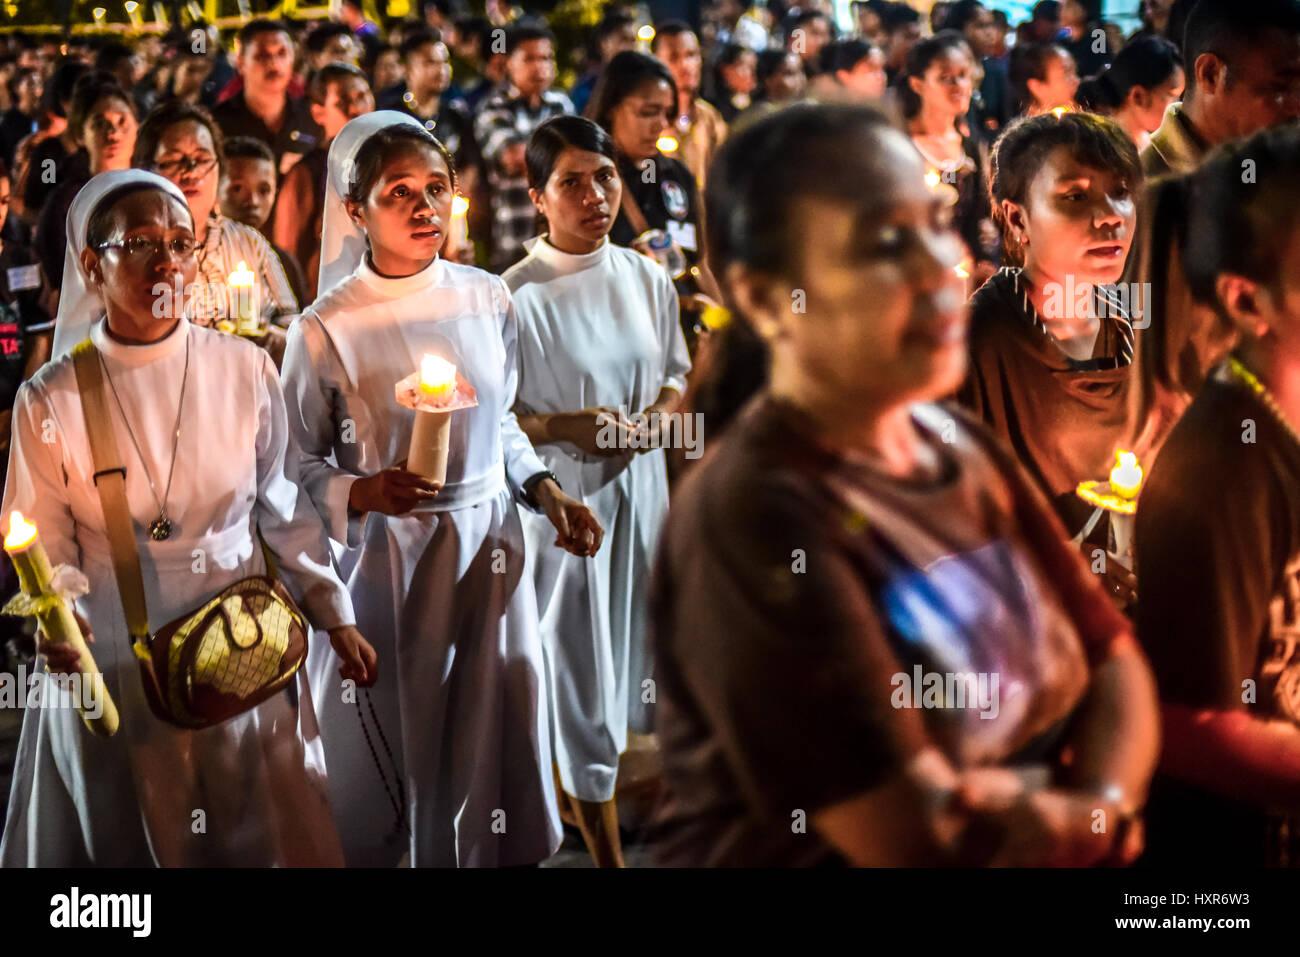 Roman Catholic nuns march among the crowd during Semana Santa procession as a part of Holy Week celebration in Larantuka, - Stock Image